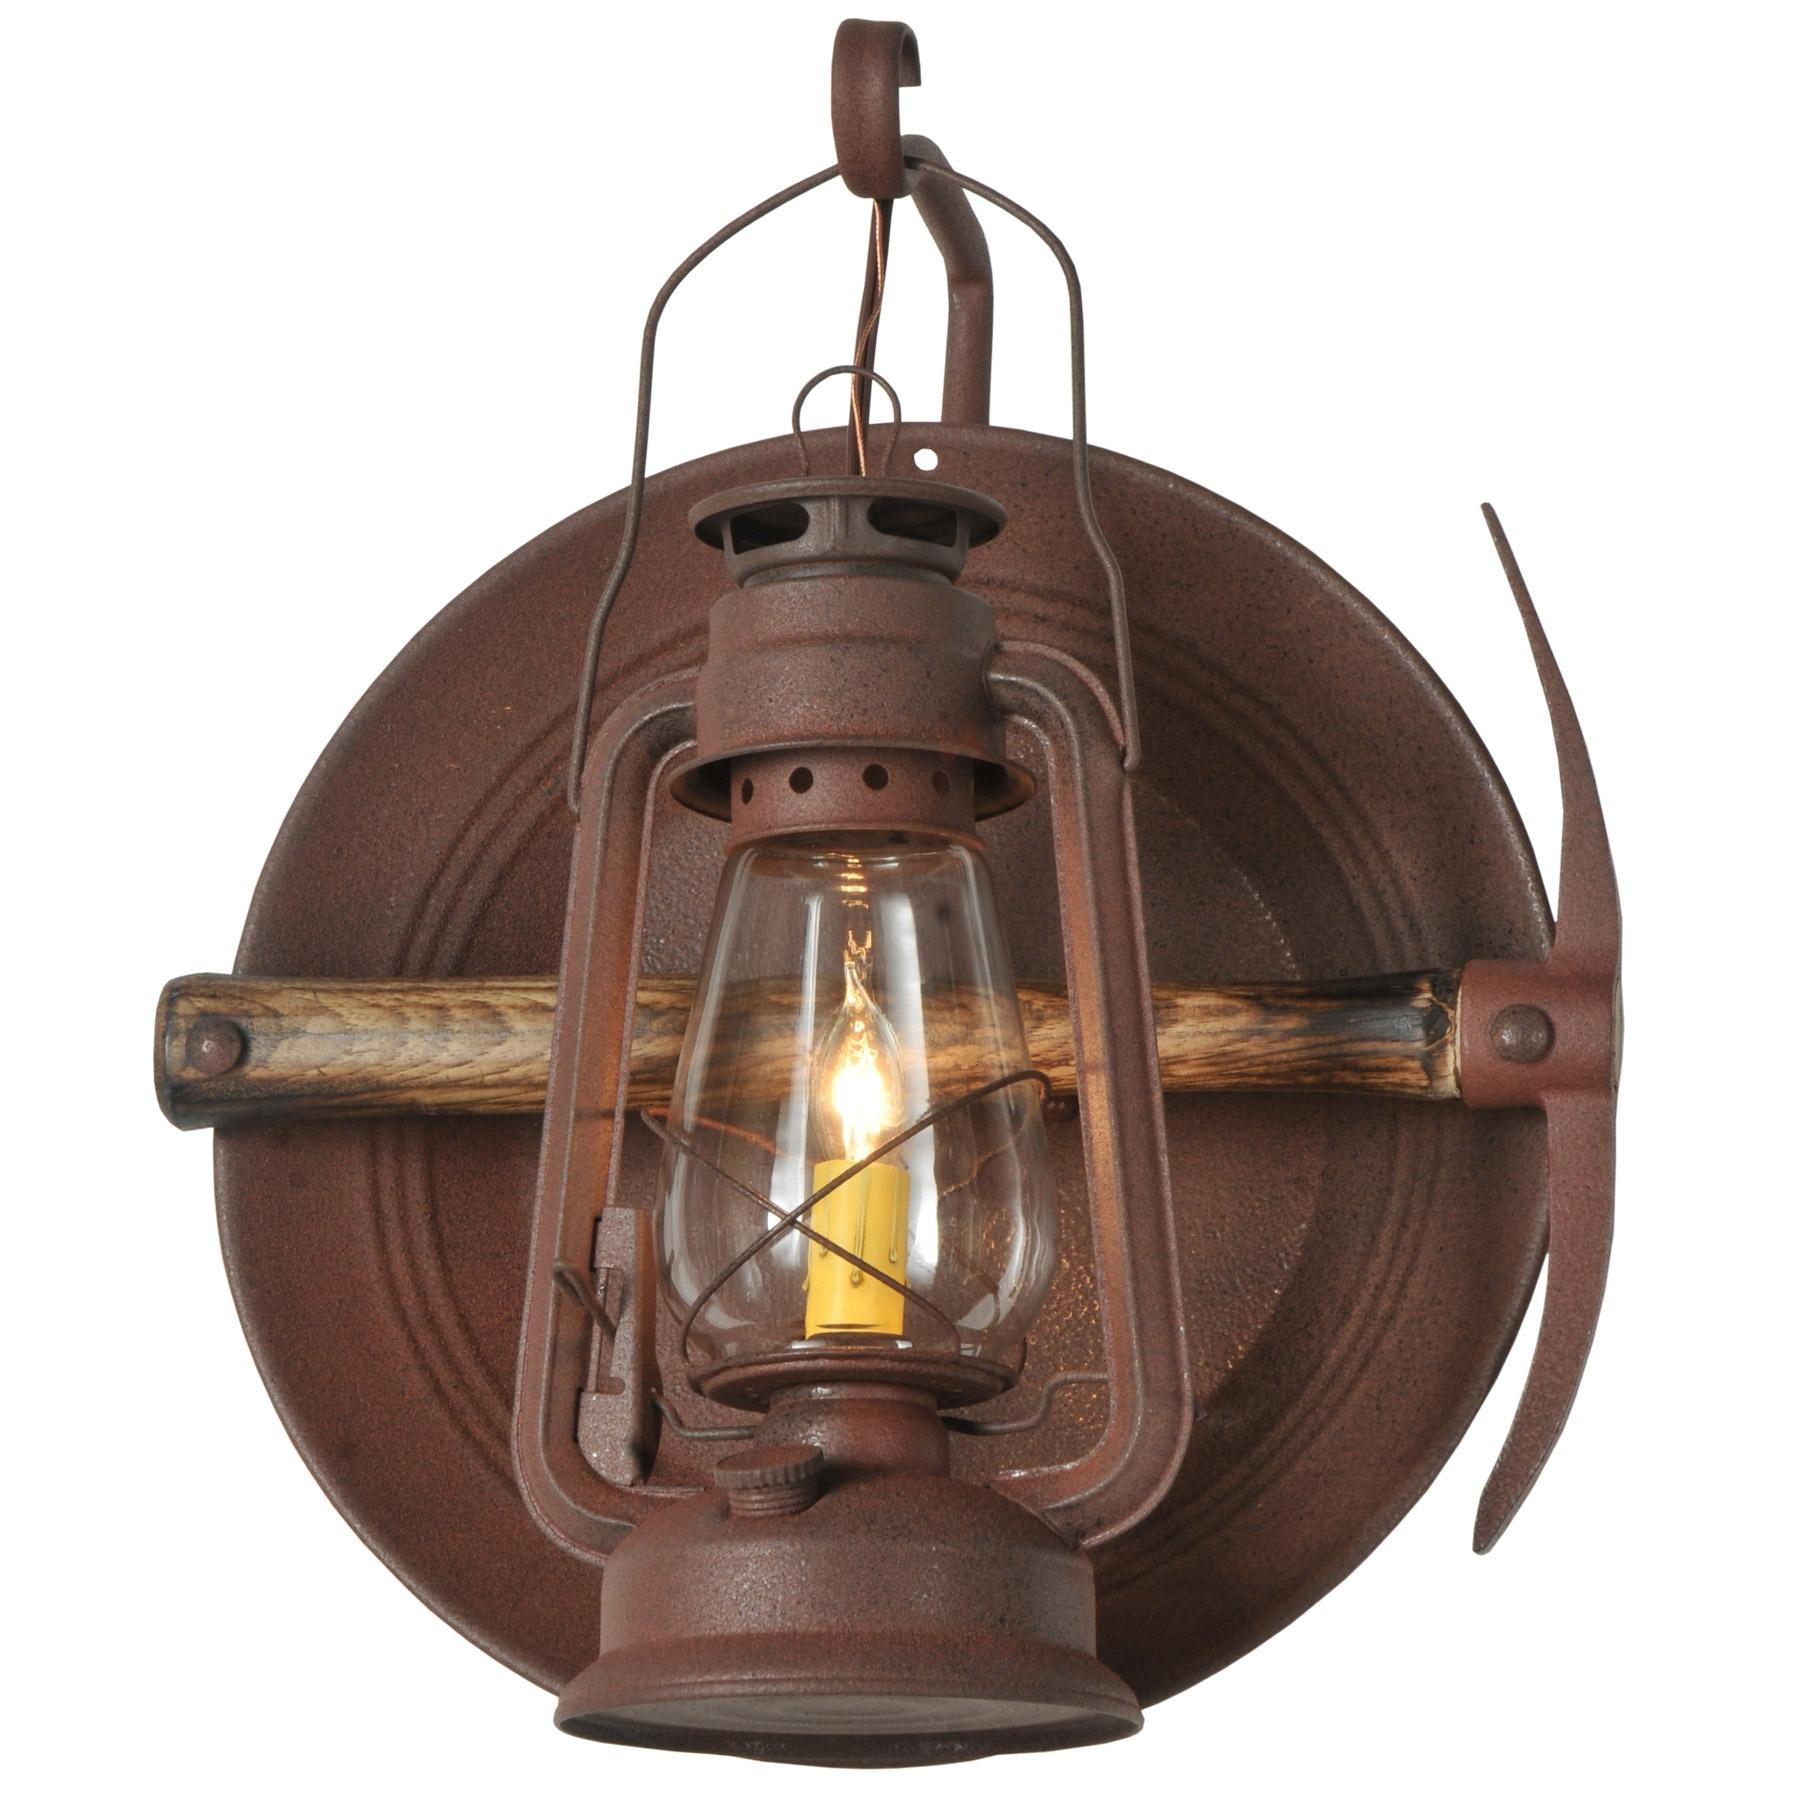 Rustic Outdoor Electric Lanterns Regarding Favorite Meyda 114829 Miners Lantern Wall Sconce (View 5 of 20)